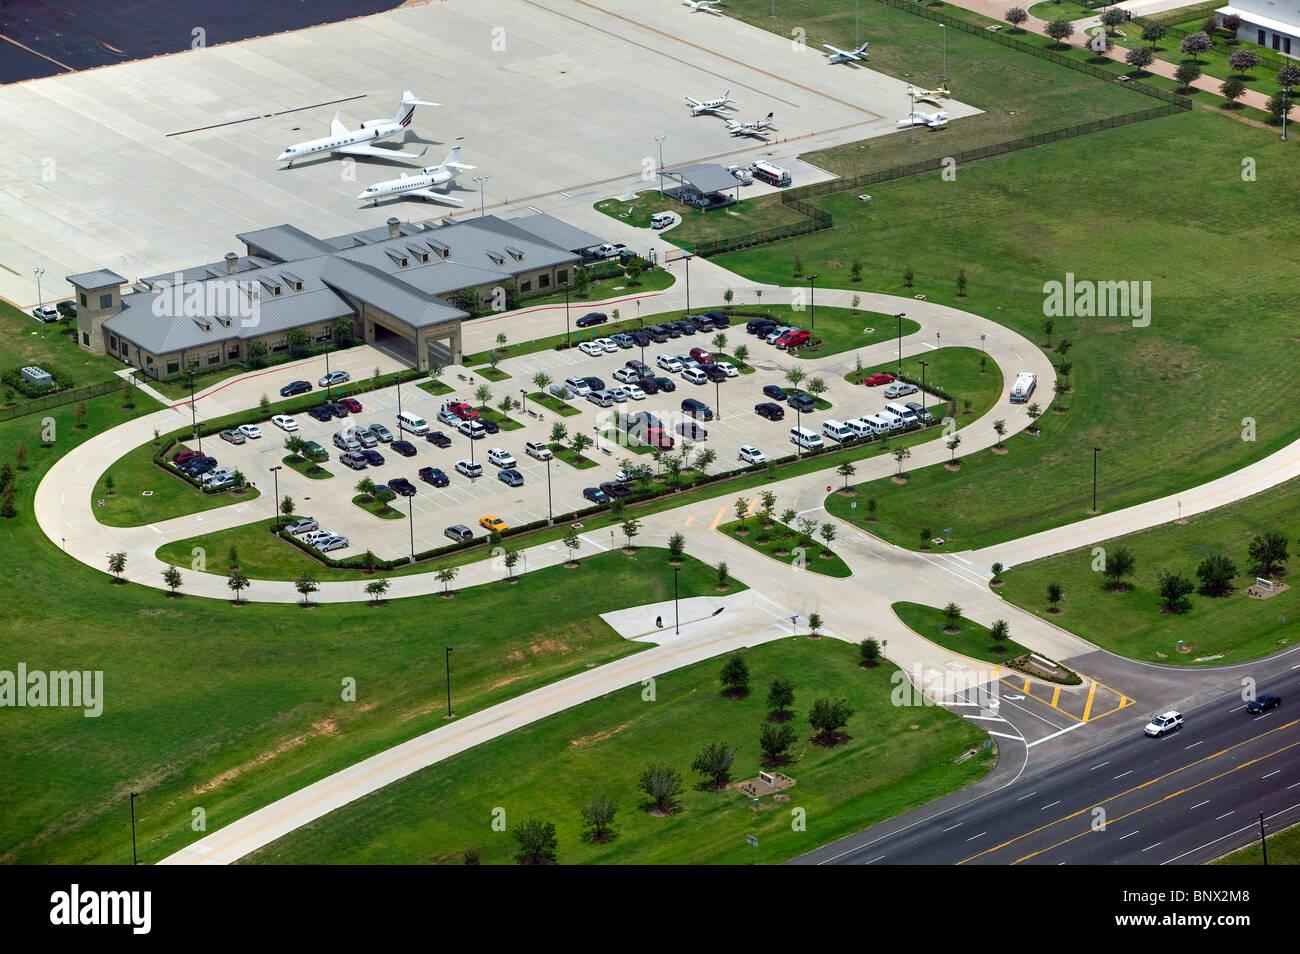 aerial view above airport terminal Sugar Land Texas Stock ...